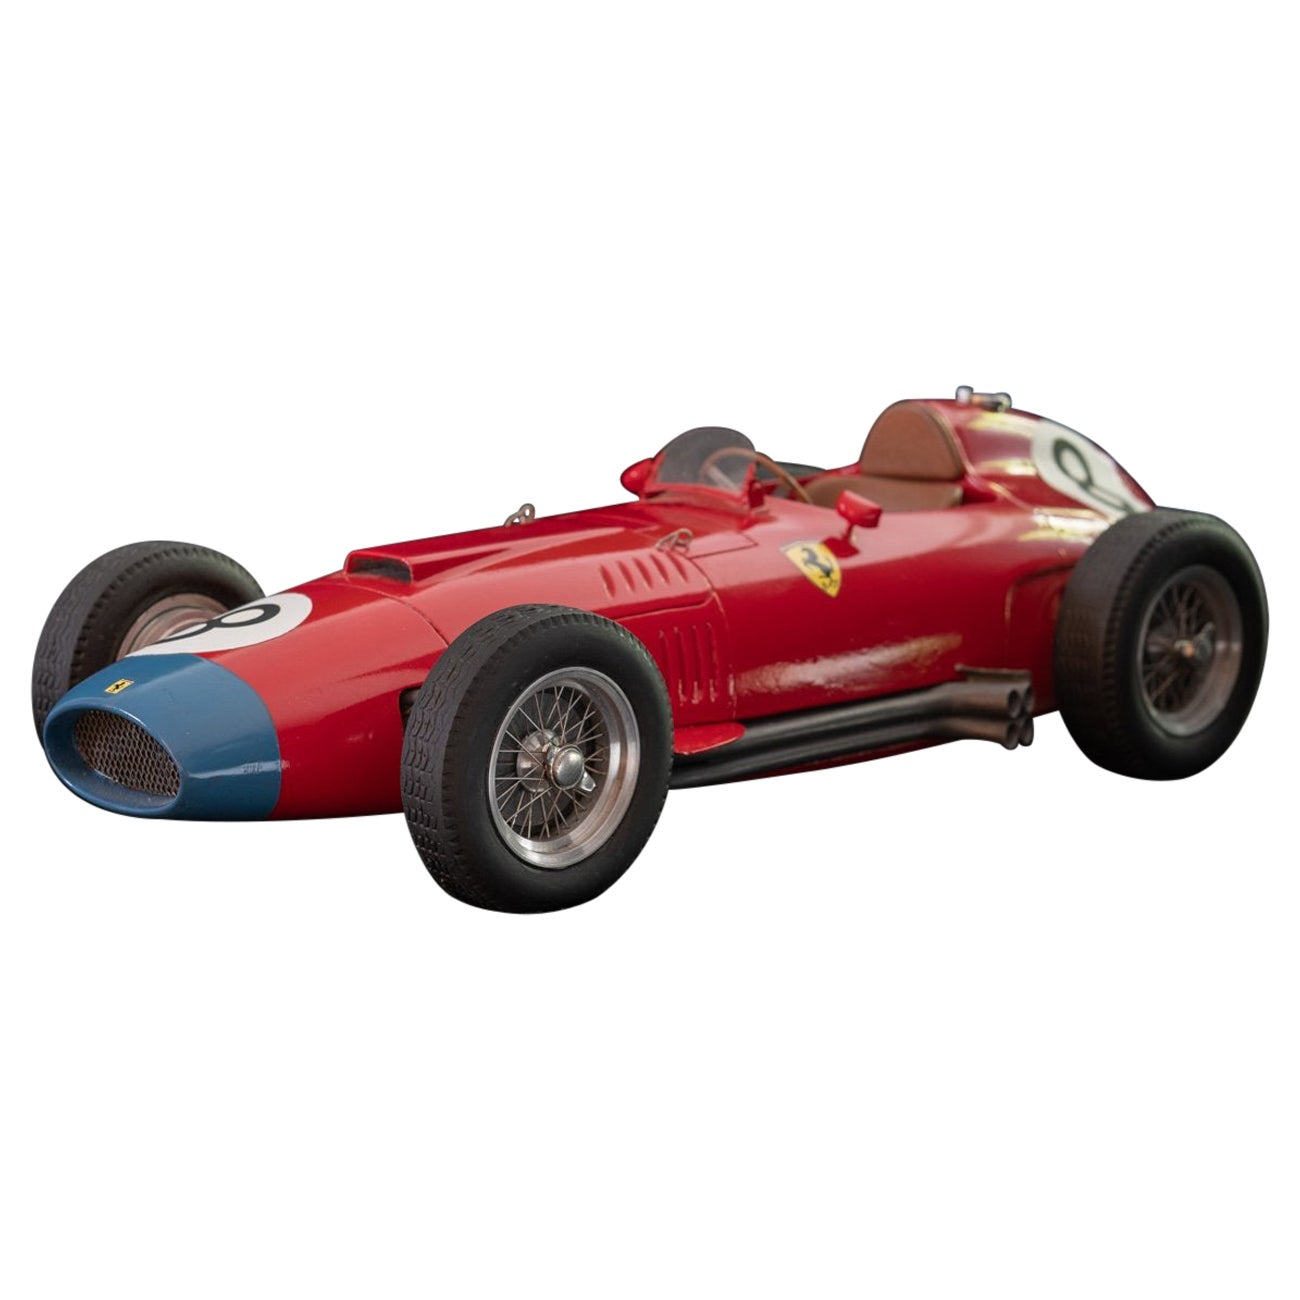 Model of the Ferrari 801 Racing Car